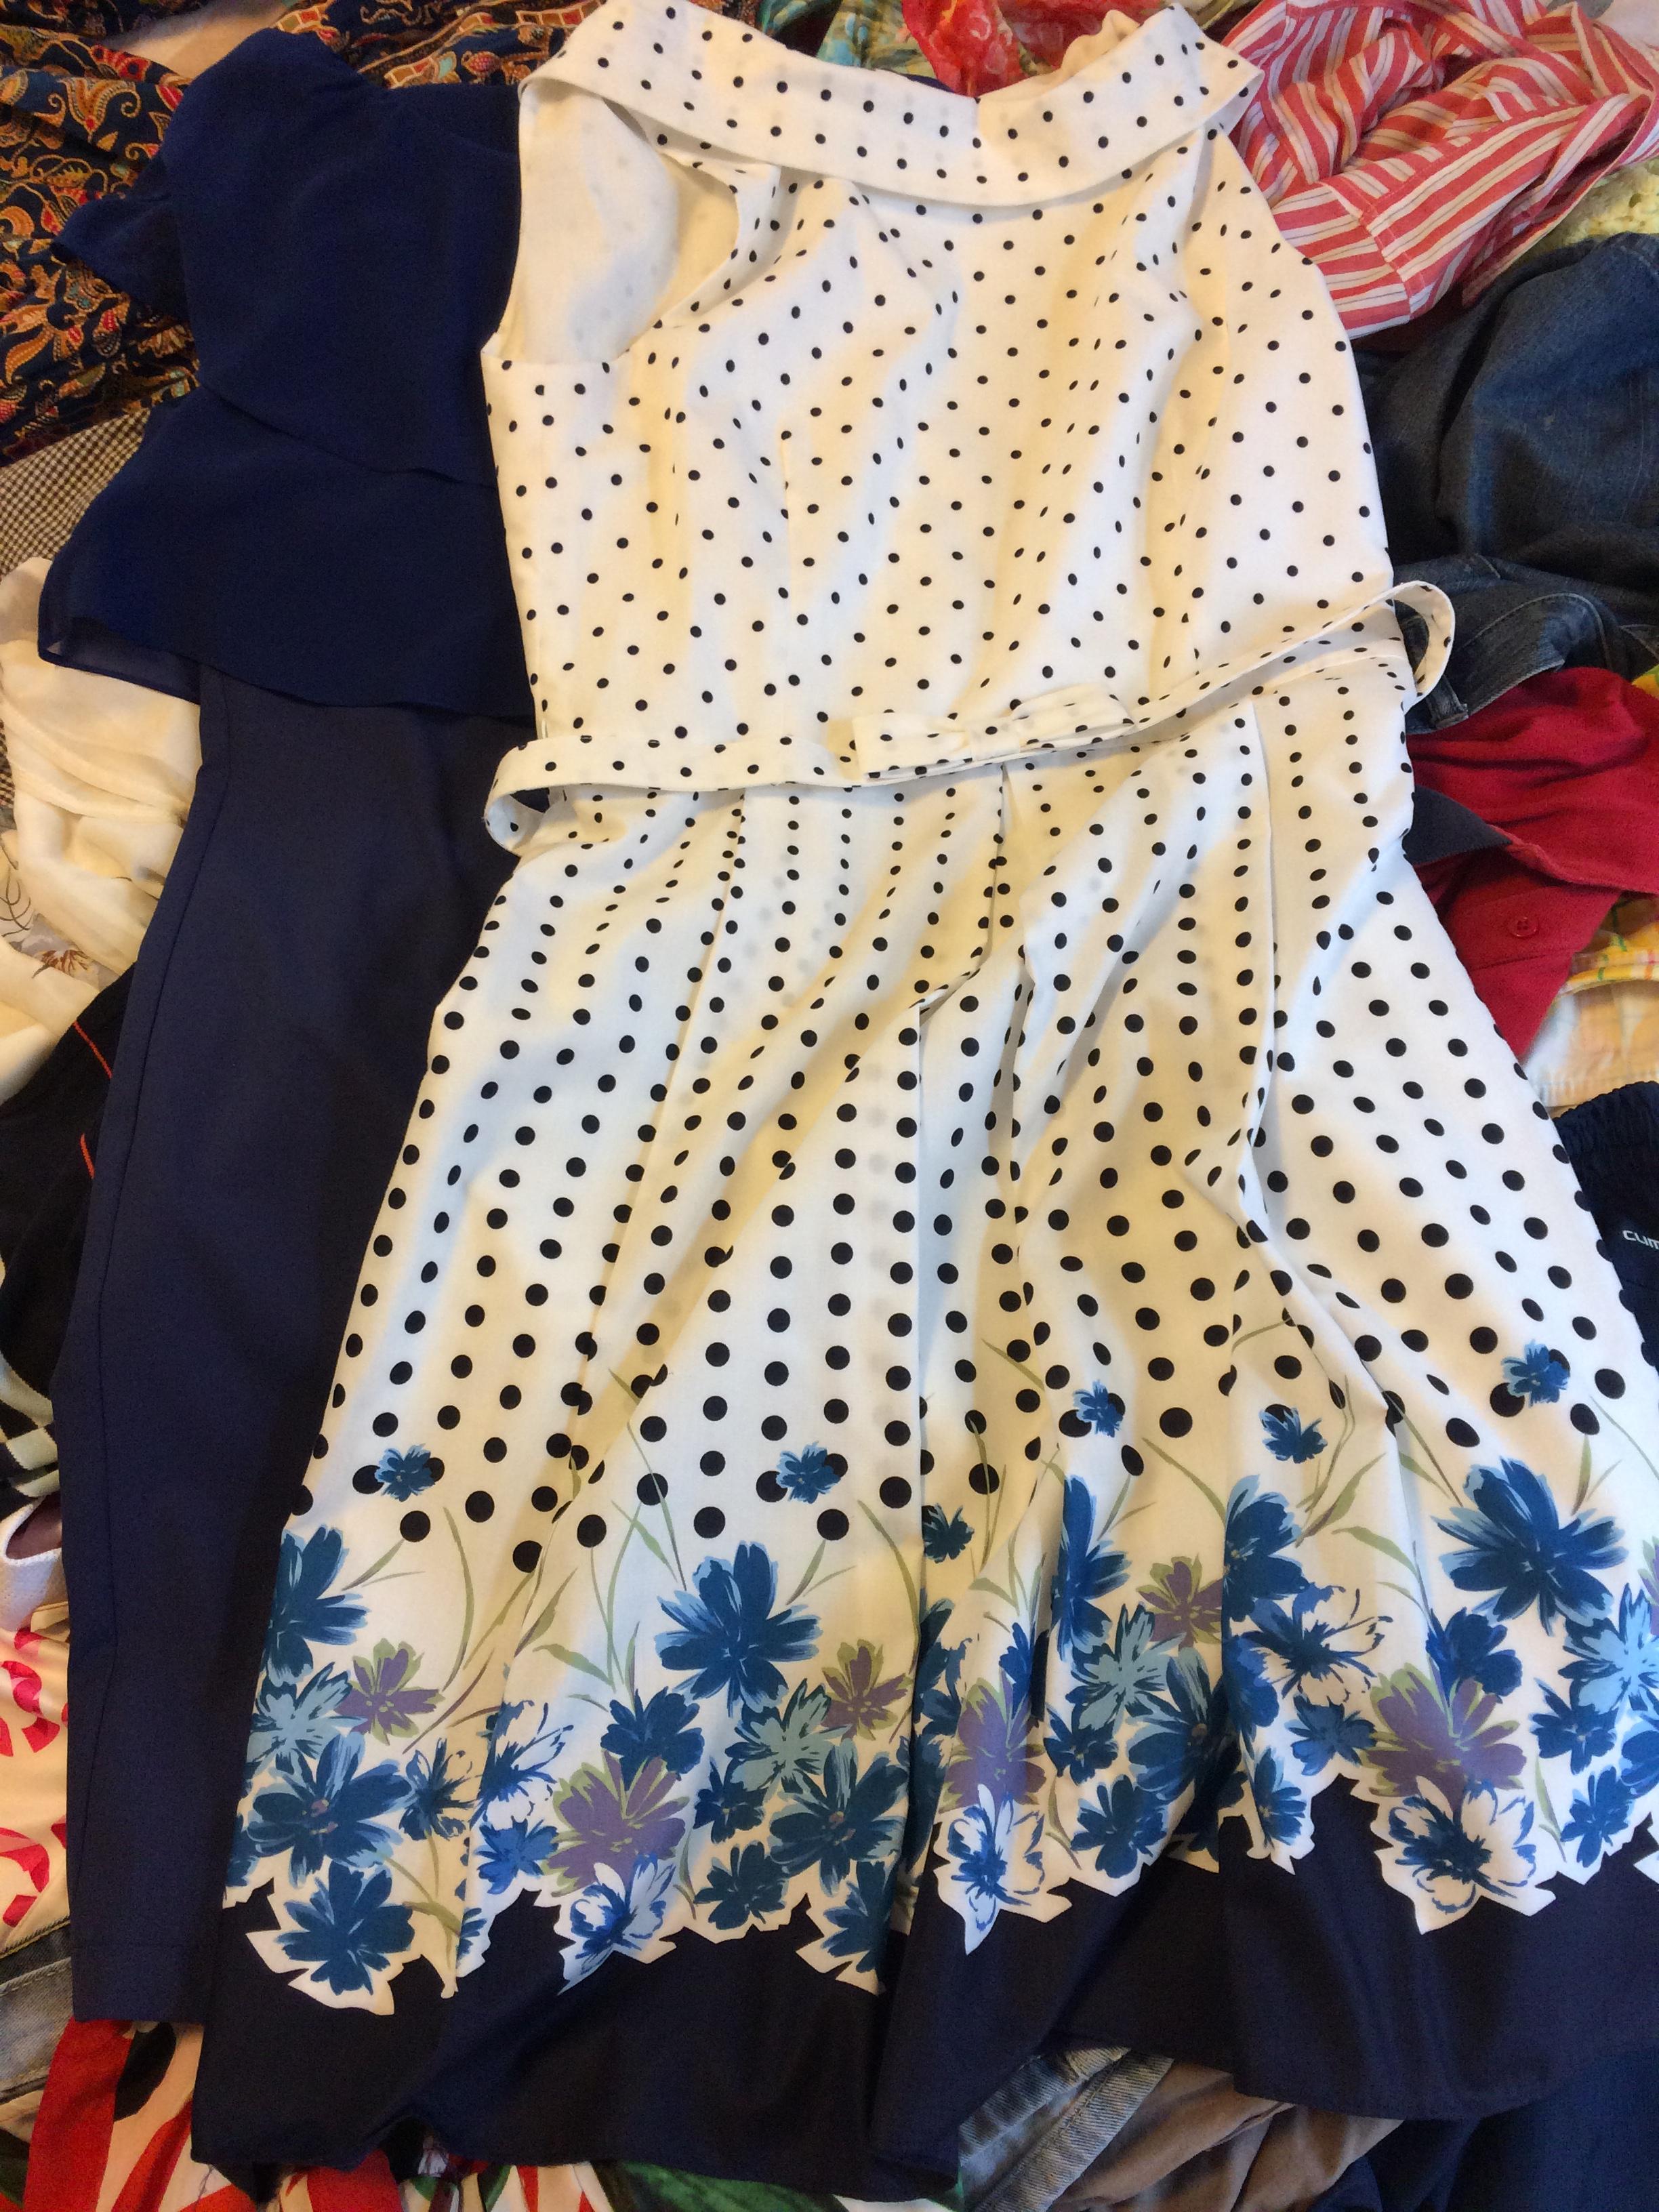 Summer Mixed Used Clothing